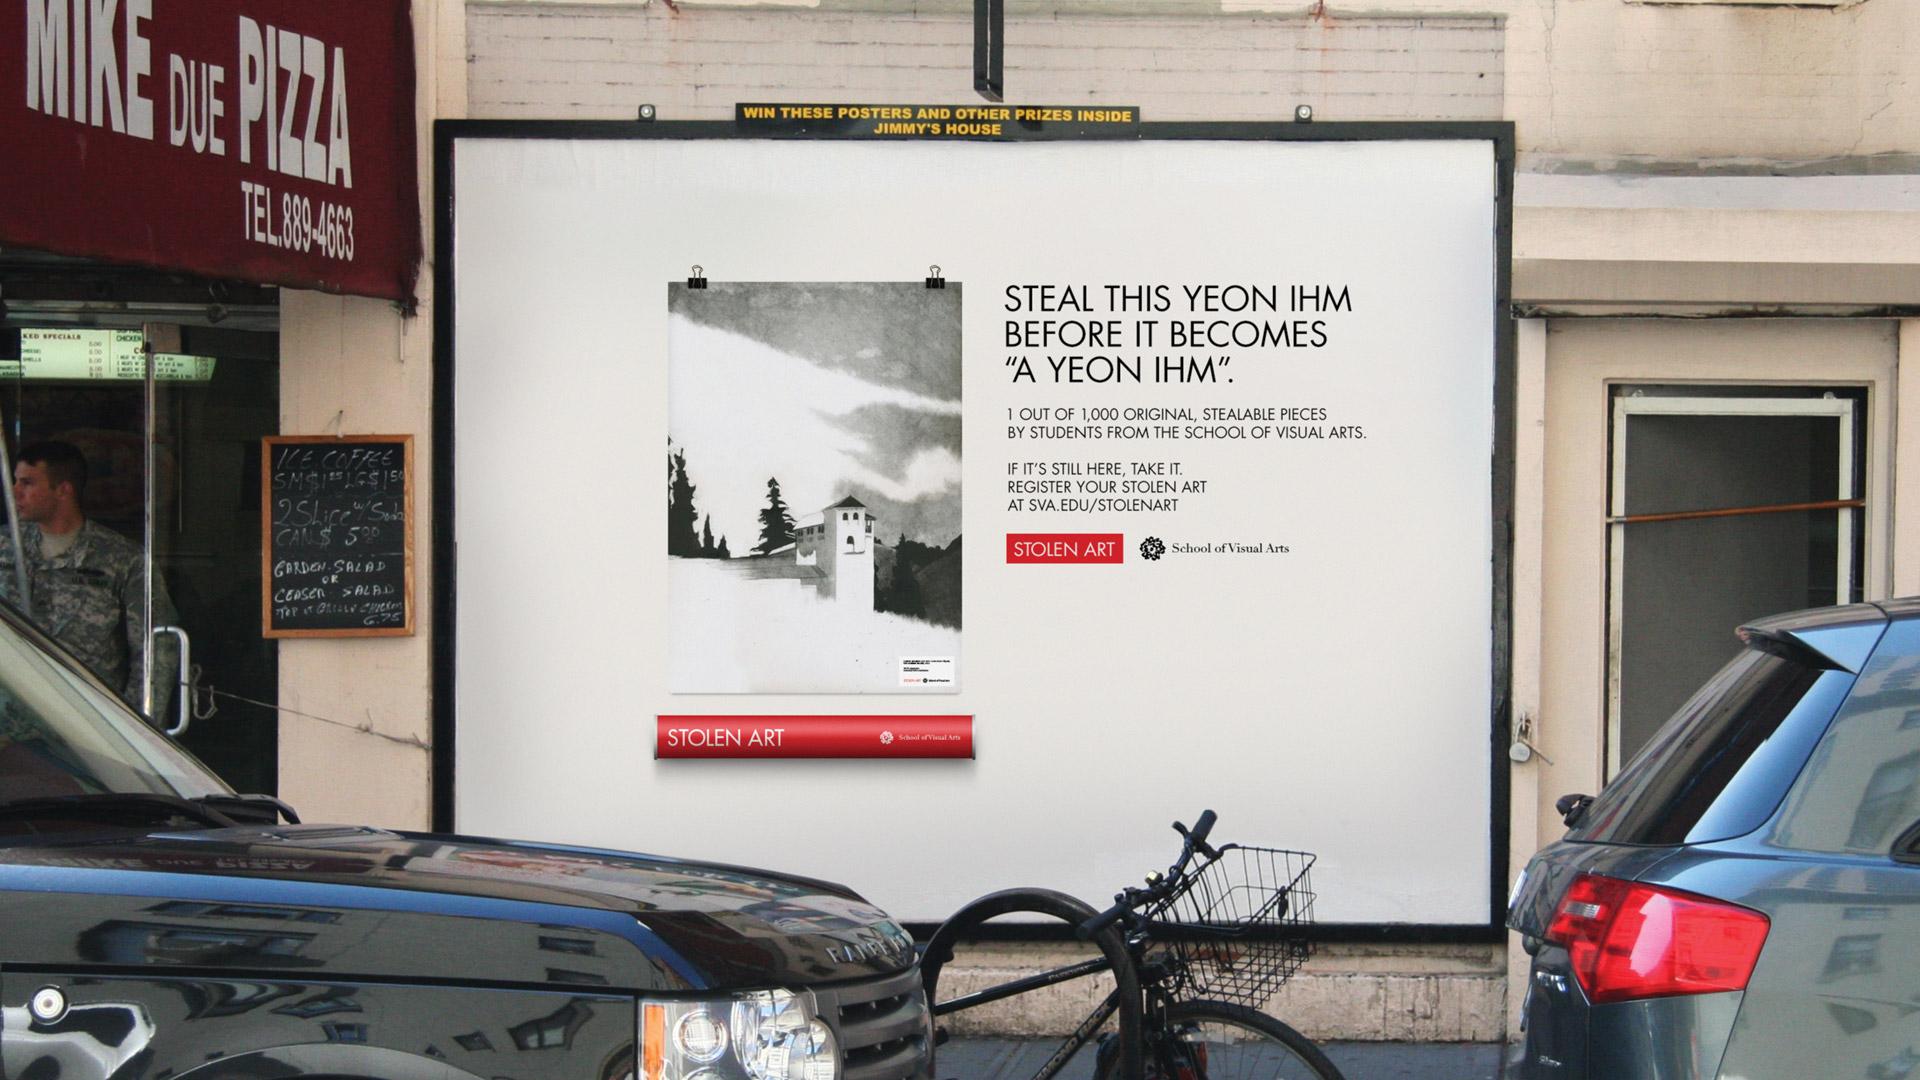 Tal_Shub_SVA_Campaign.jpg